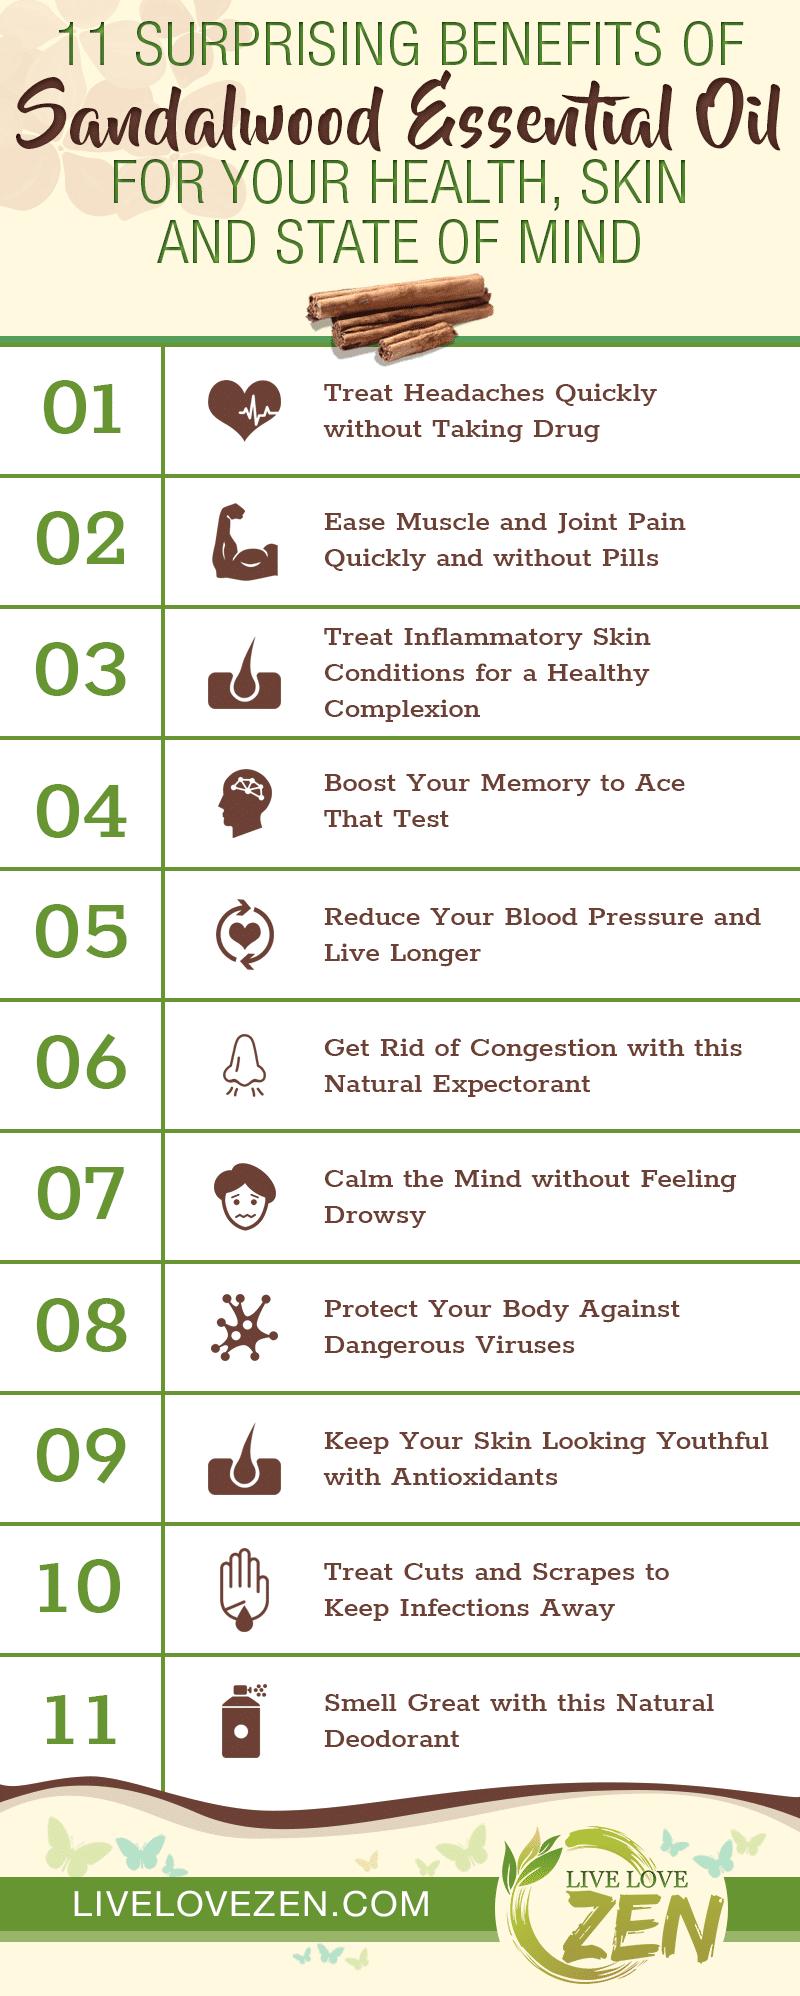 sandalwood essential oil health benefits